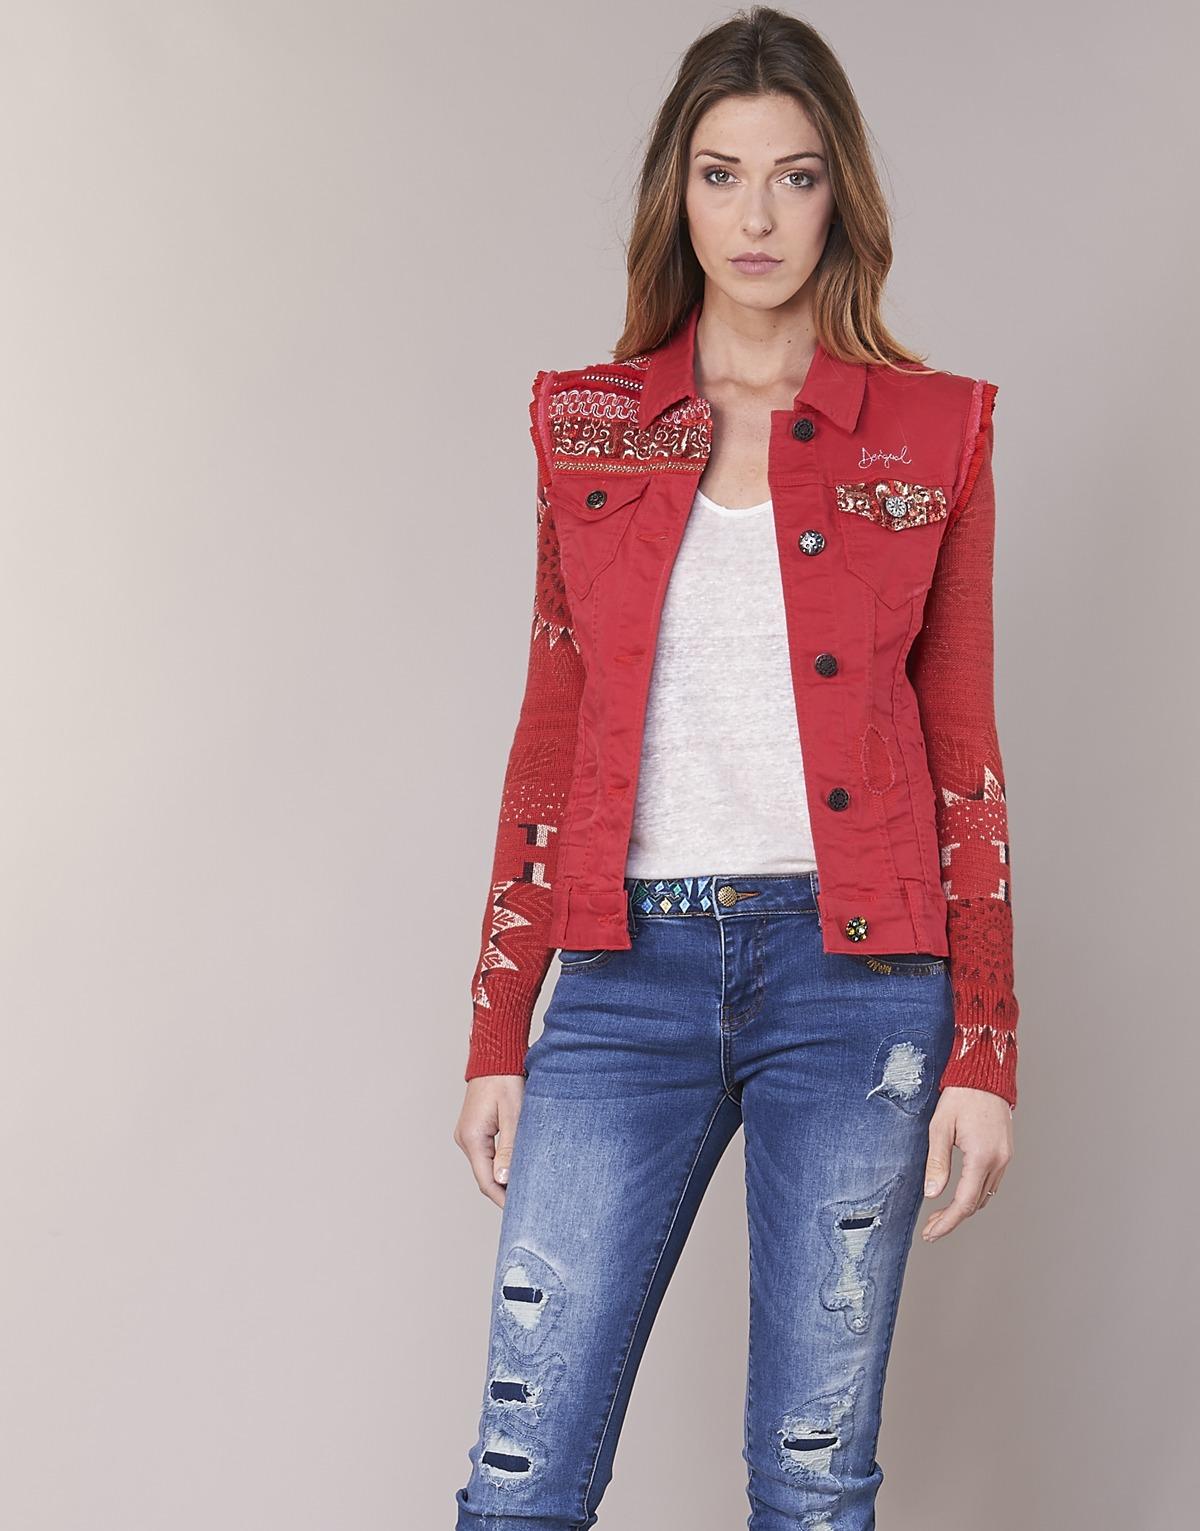 Desigual PALOSHO Rouge Veste en Jean